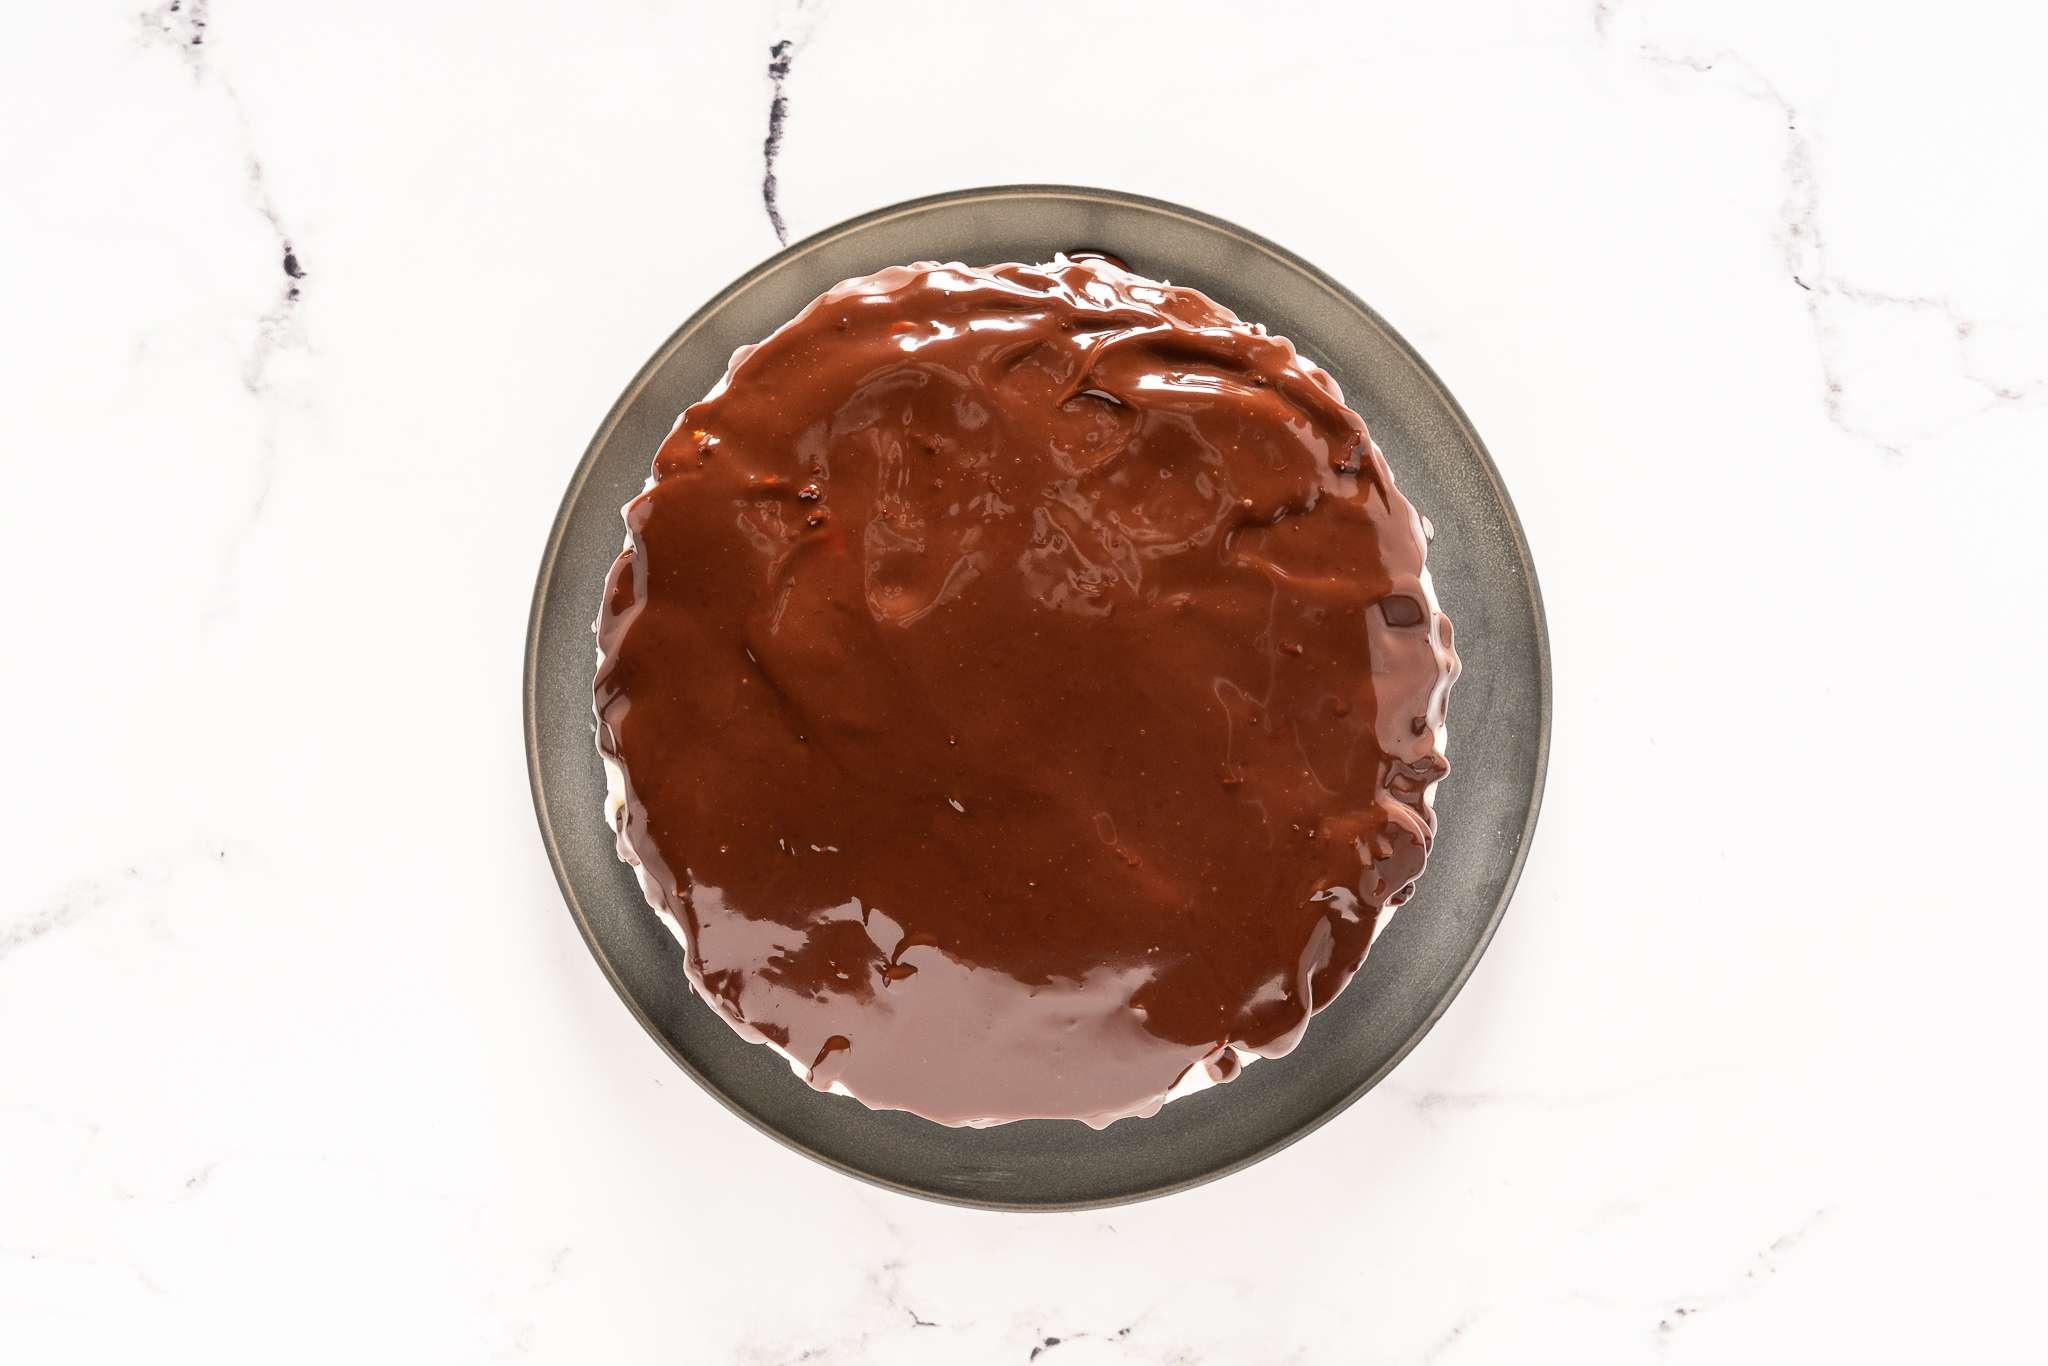 Chocolate ganache poured over cake